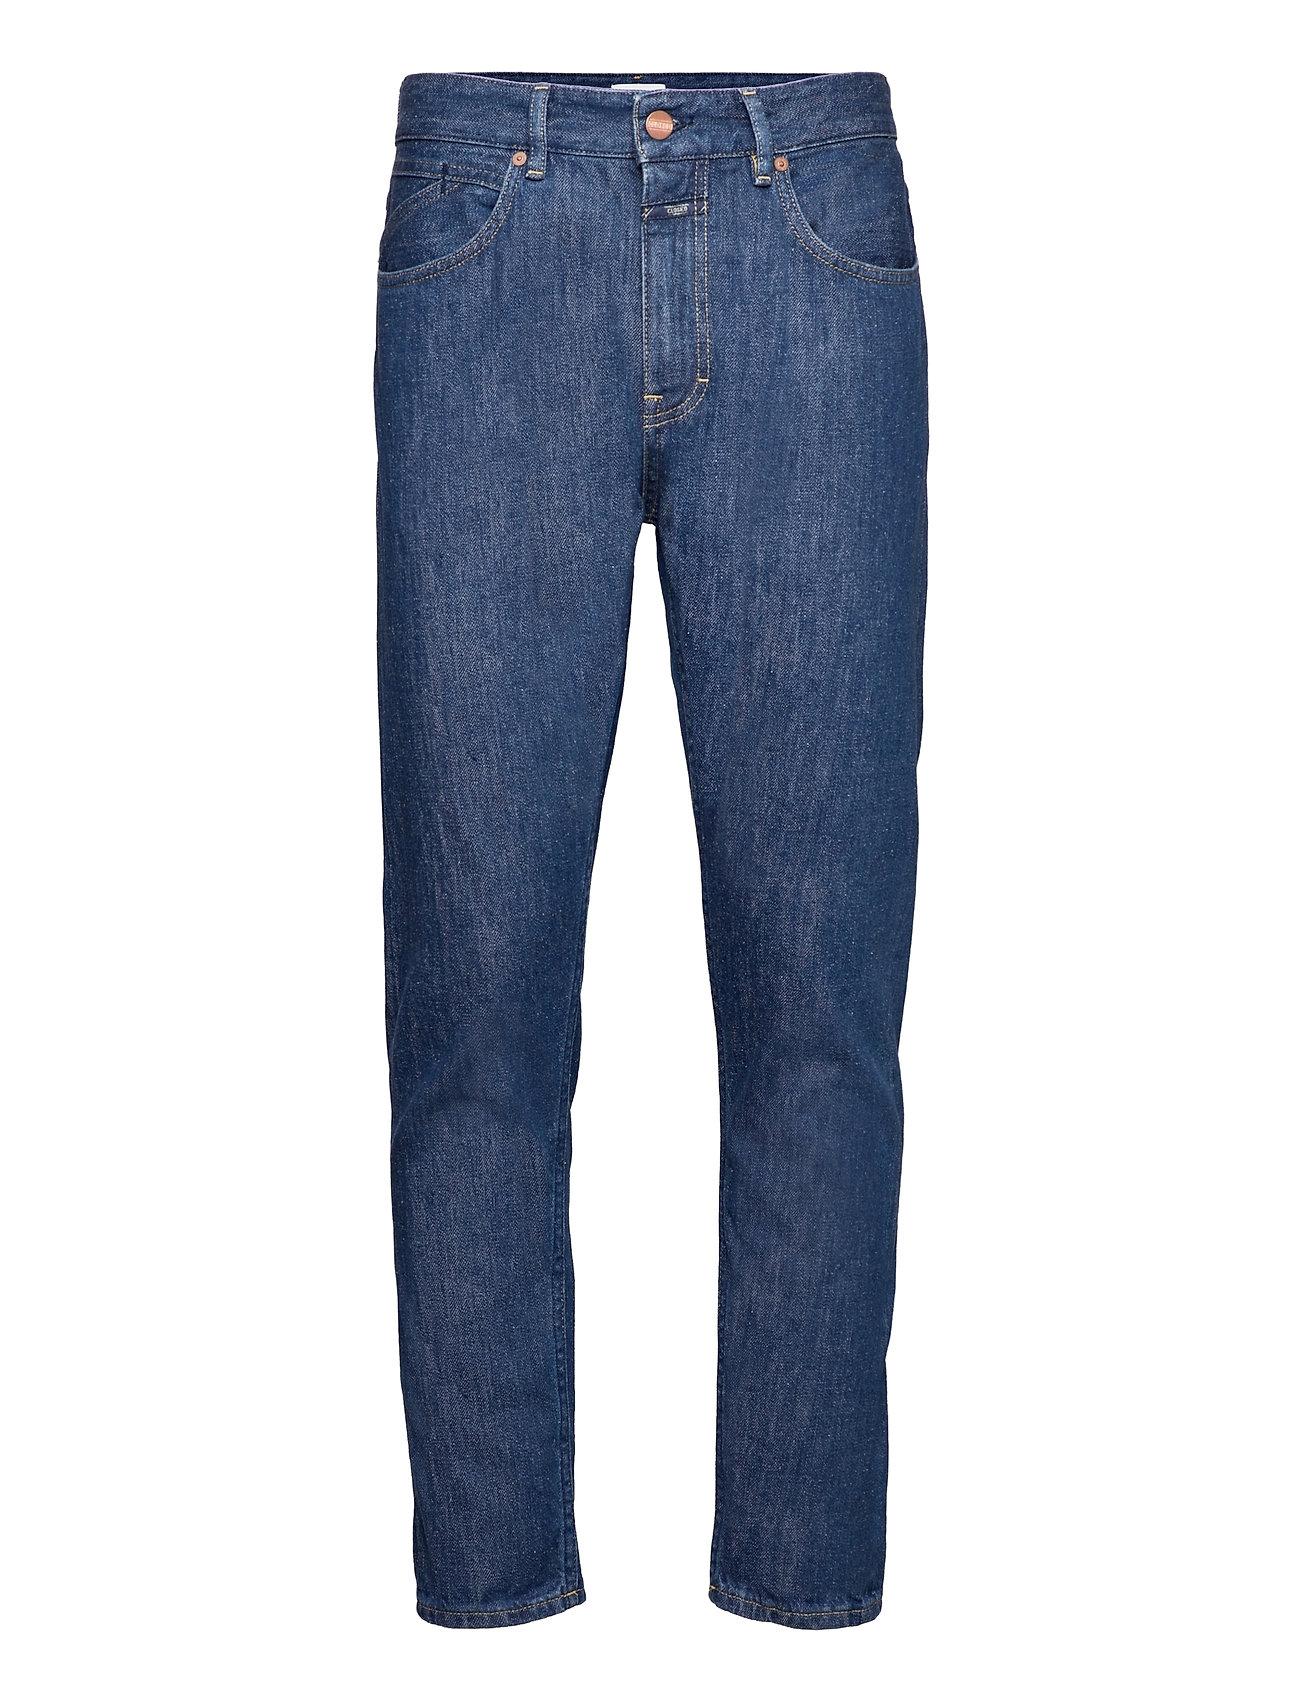 Image of Mens Pant Jeans Blå Closed (3545114795)